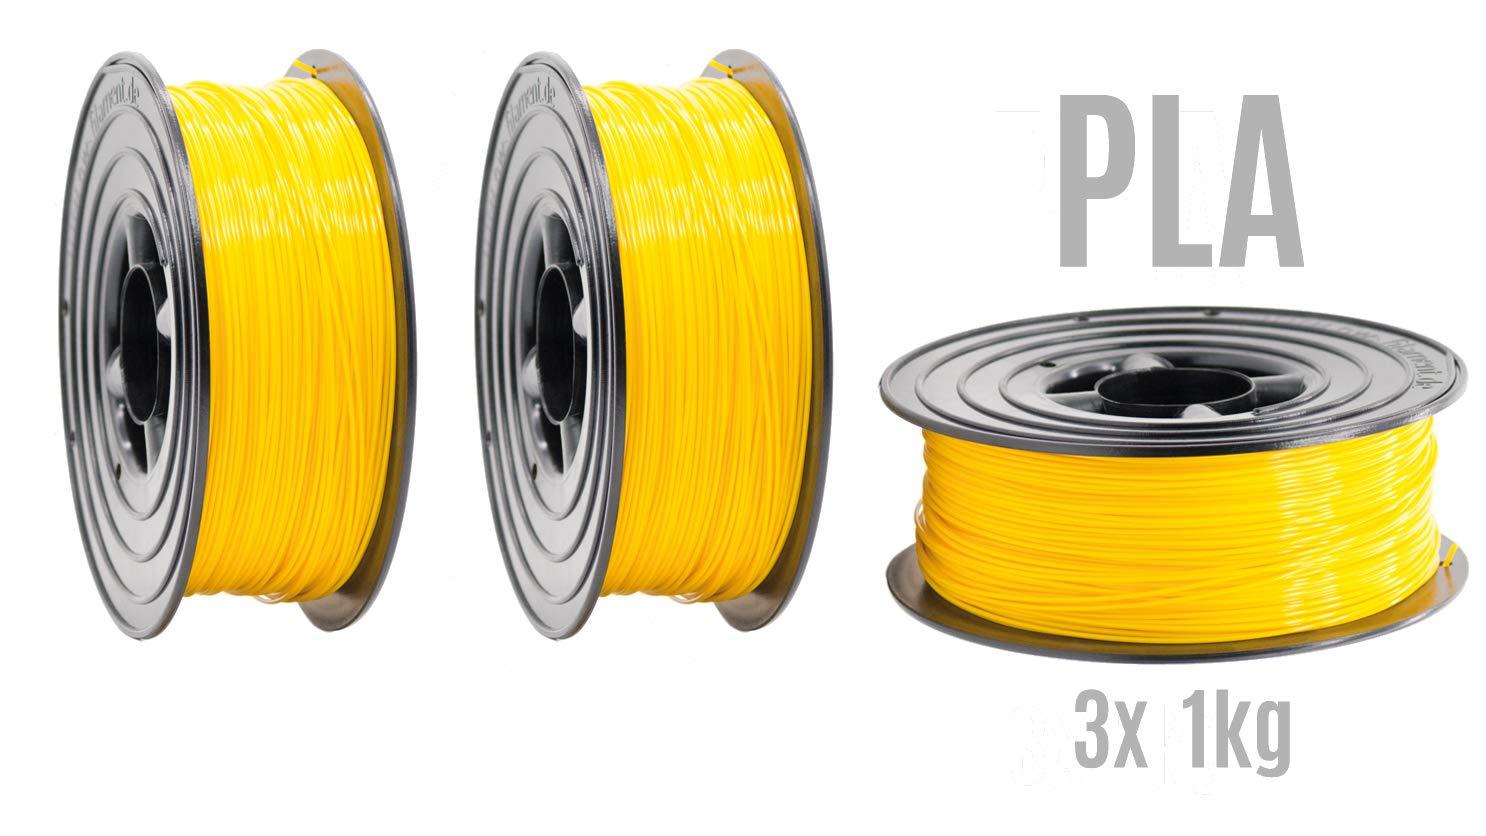 Filamento PLA para impresora 3D, 1,75 mm, 3 x 1 kg, rollo amarillo ...